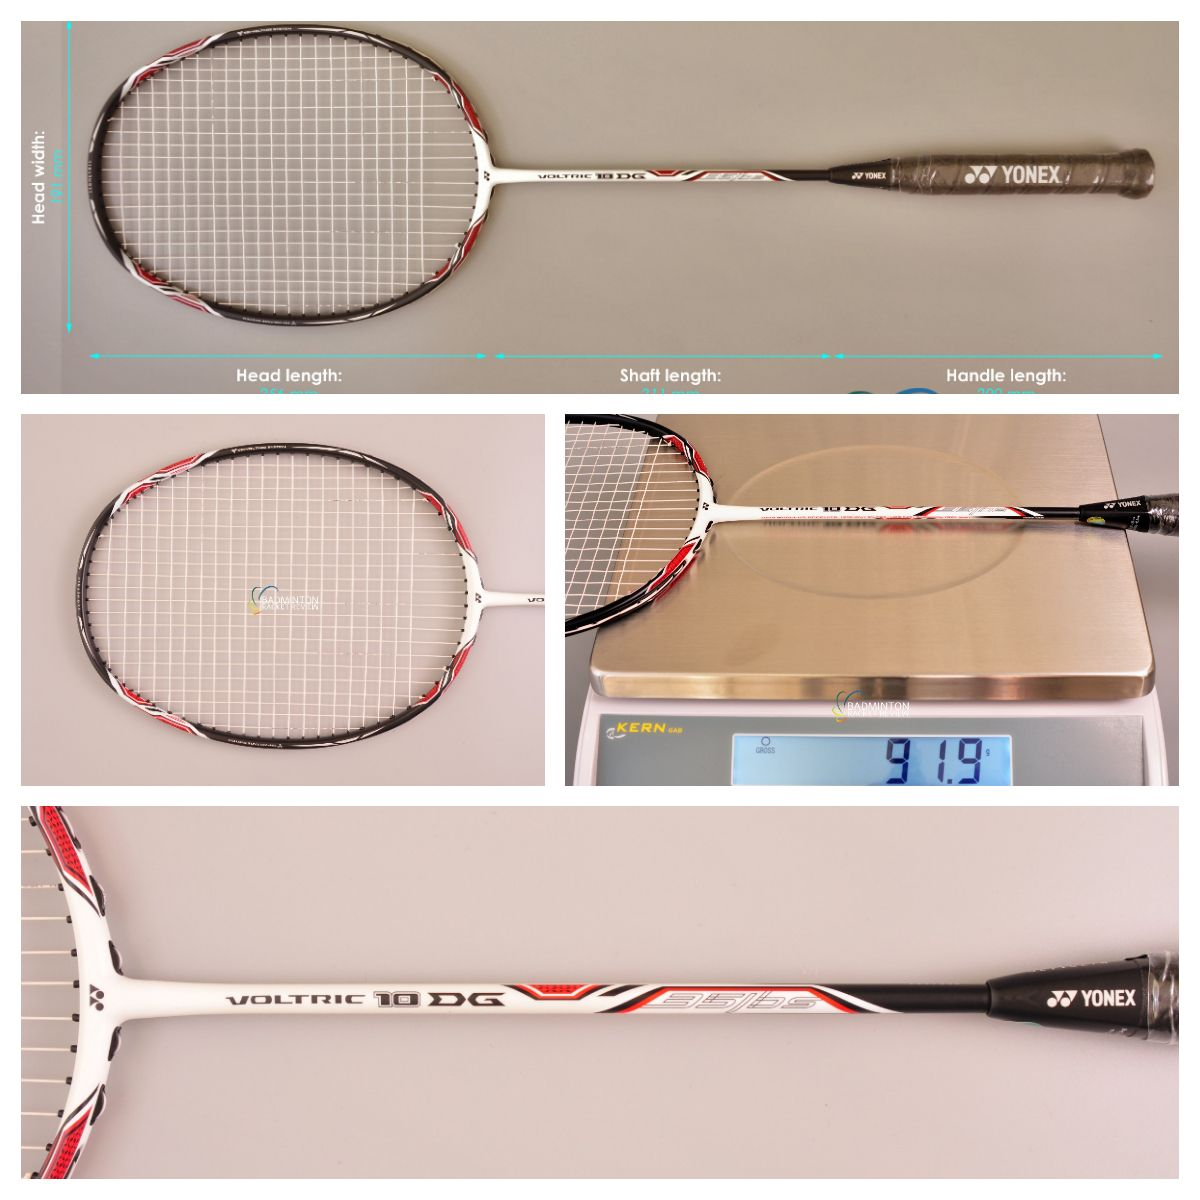 Yonex Voltric 10DG Badminton Racket Review  To find out